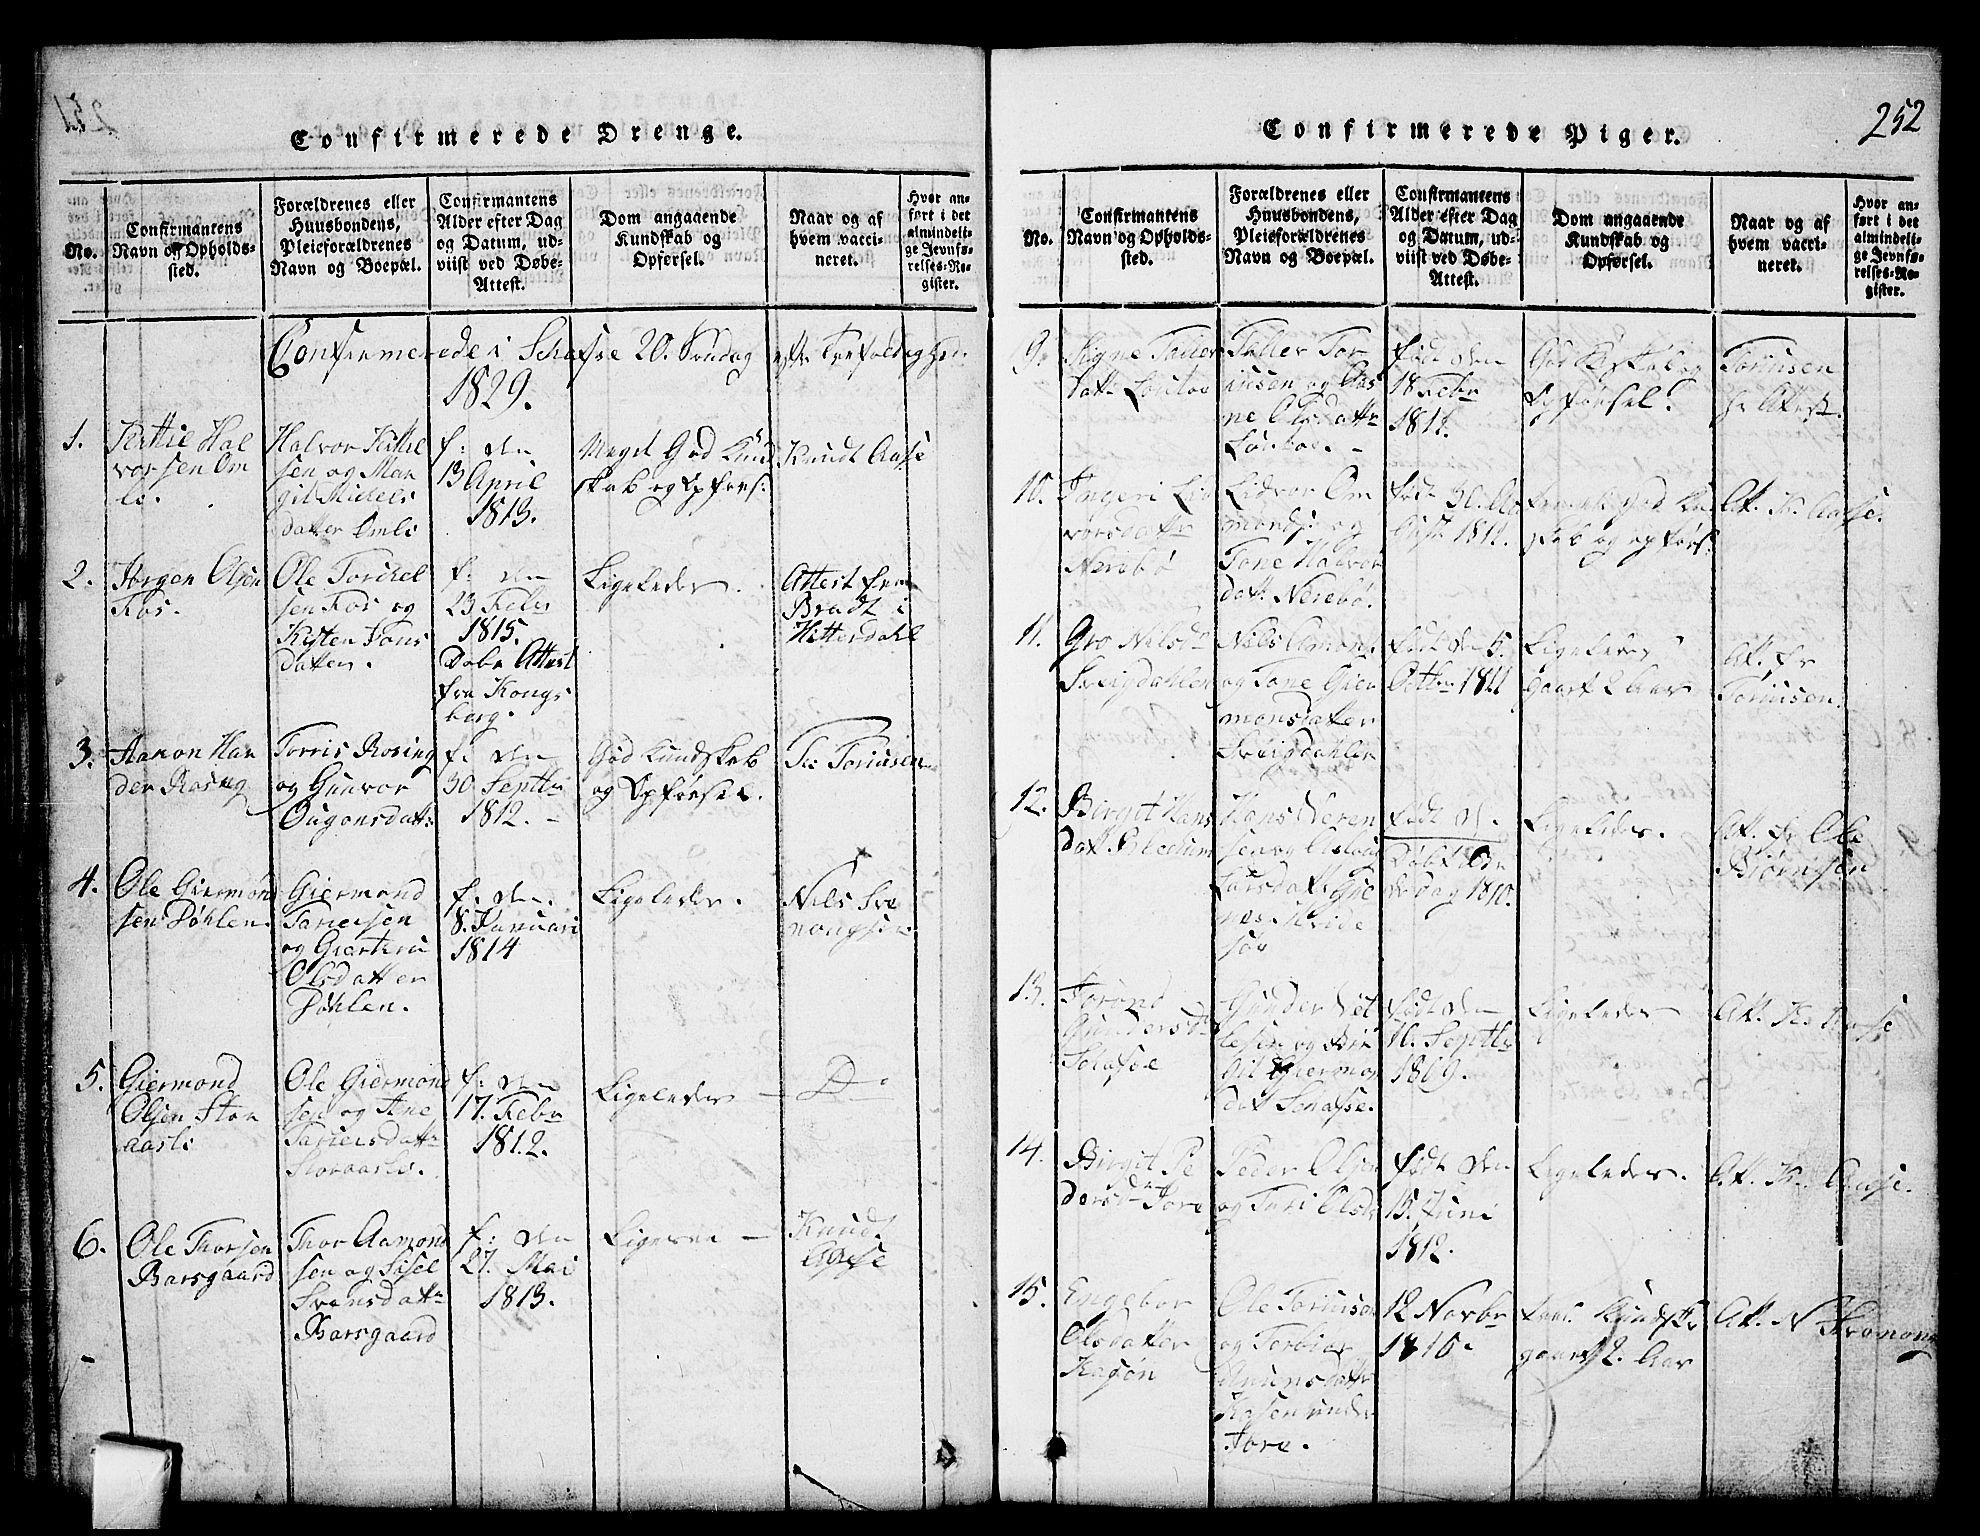 SAKO, Mo kirkebøker, G/Gb/L0001: Klokkerbok nr. II 1, 1814-1843, s. 252